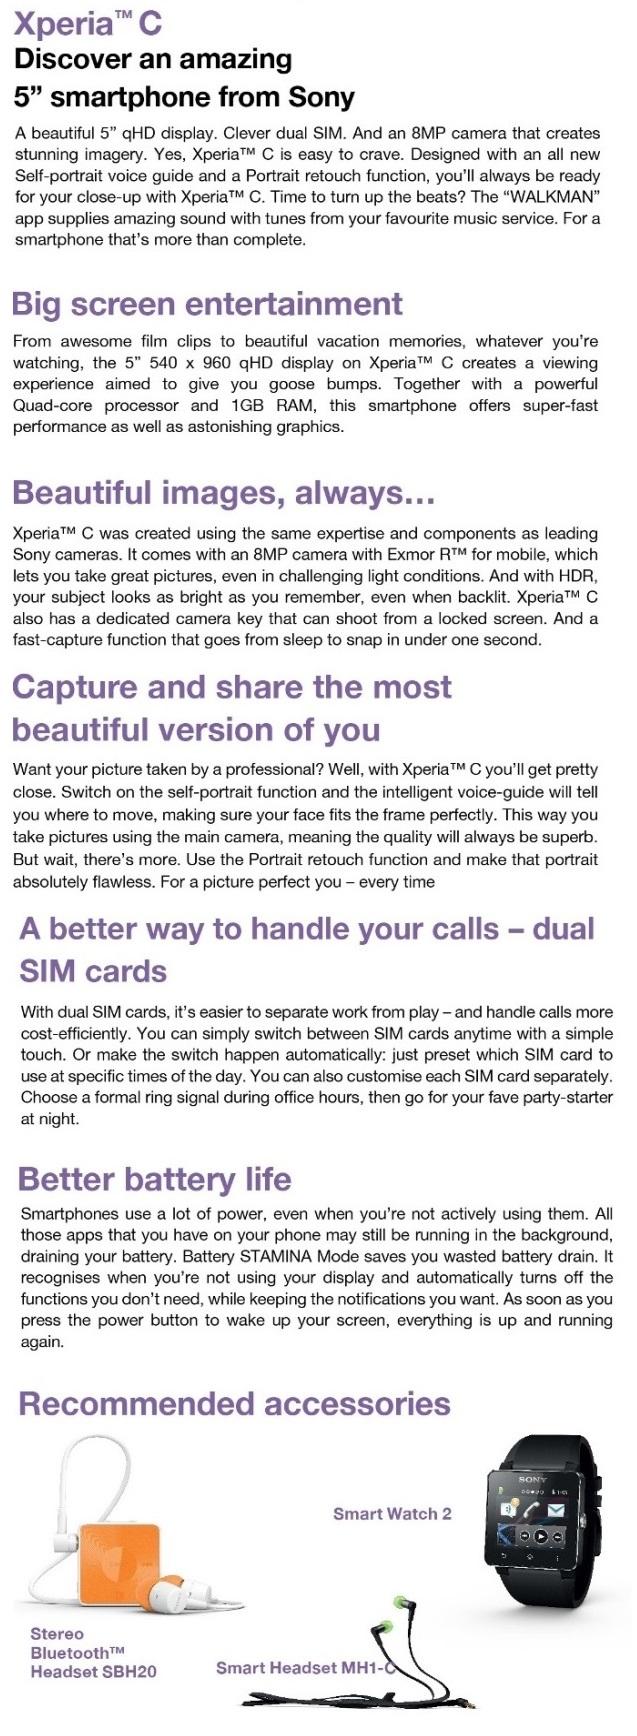 http://phoneworld.com.pk/wp-content/uploads/2014/06/Xperia-C-DL-Leaflet1-ZONG-02.jpg